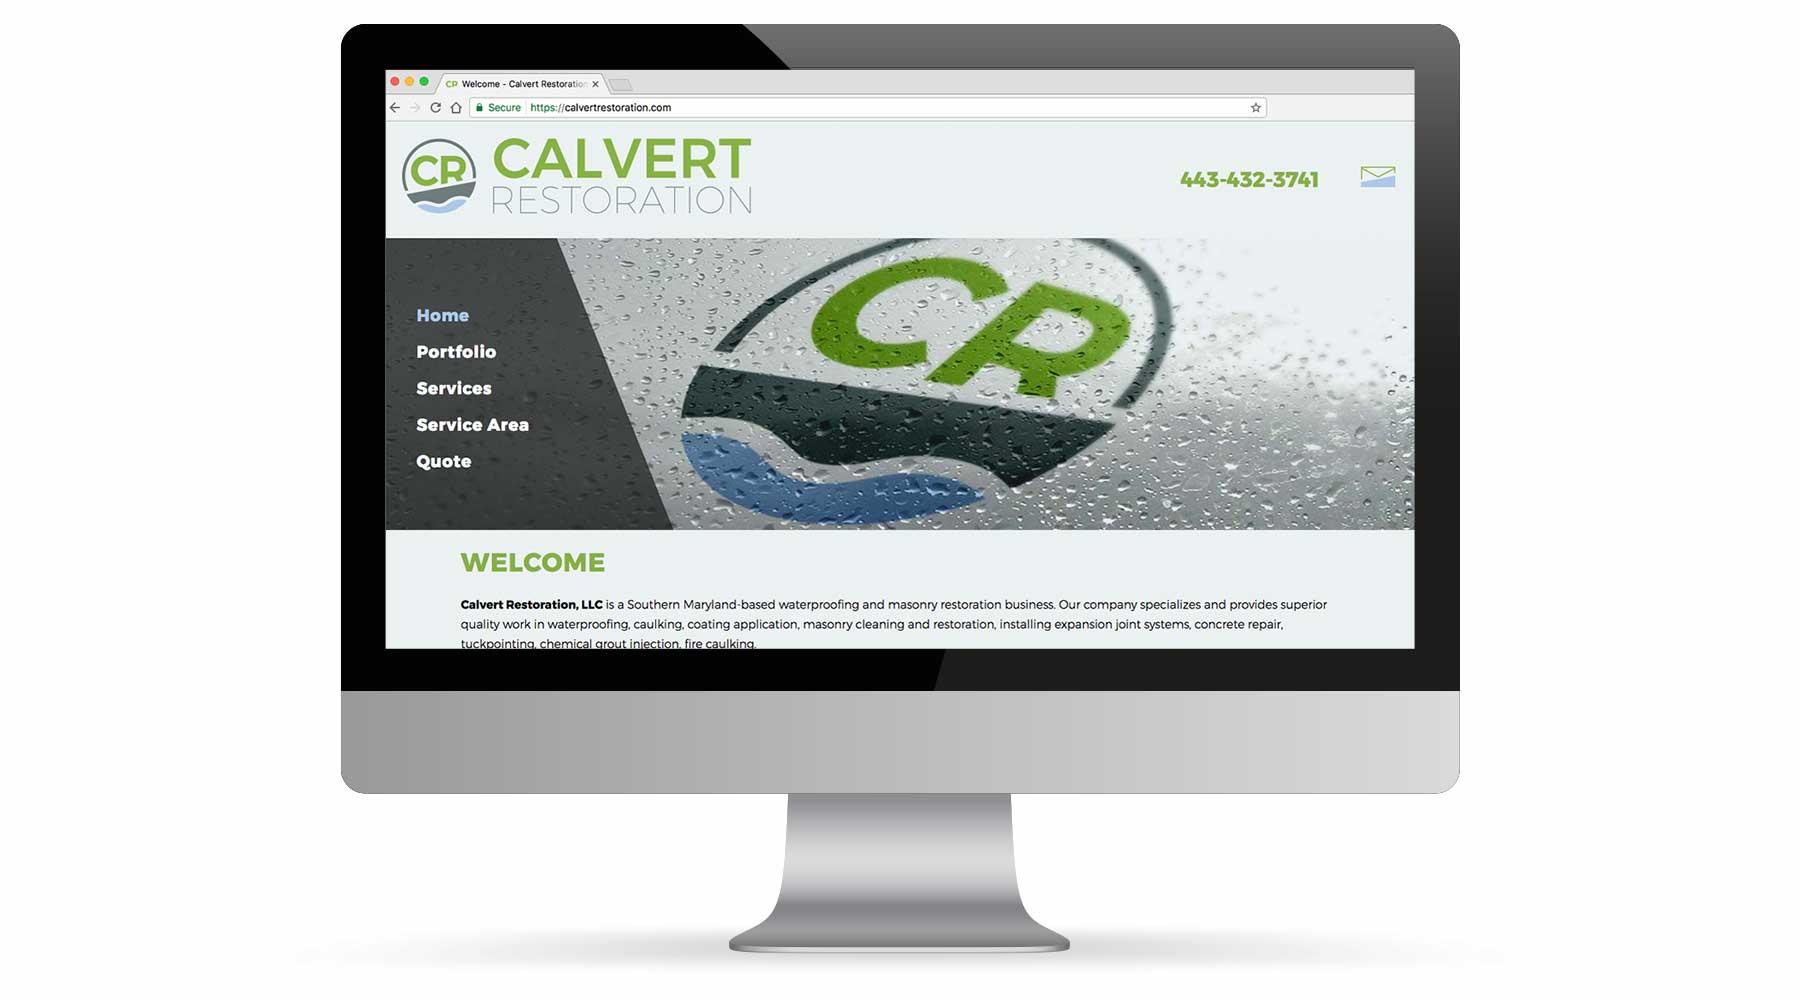 Calvert Restoration Website